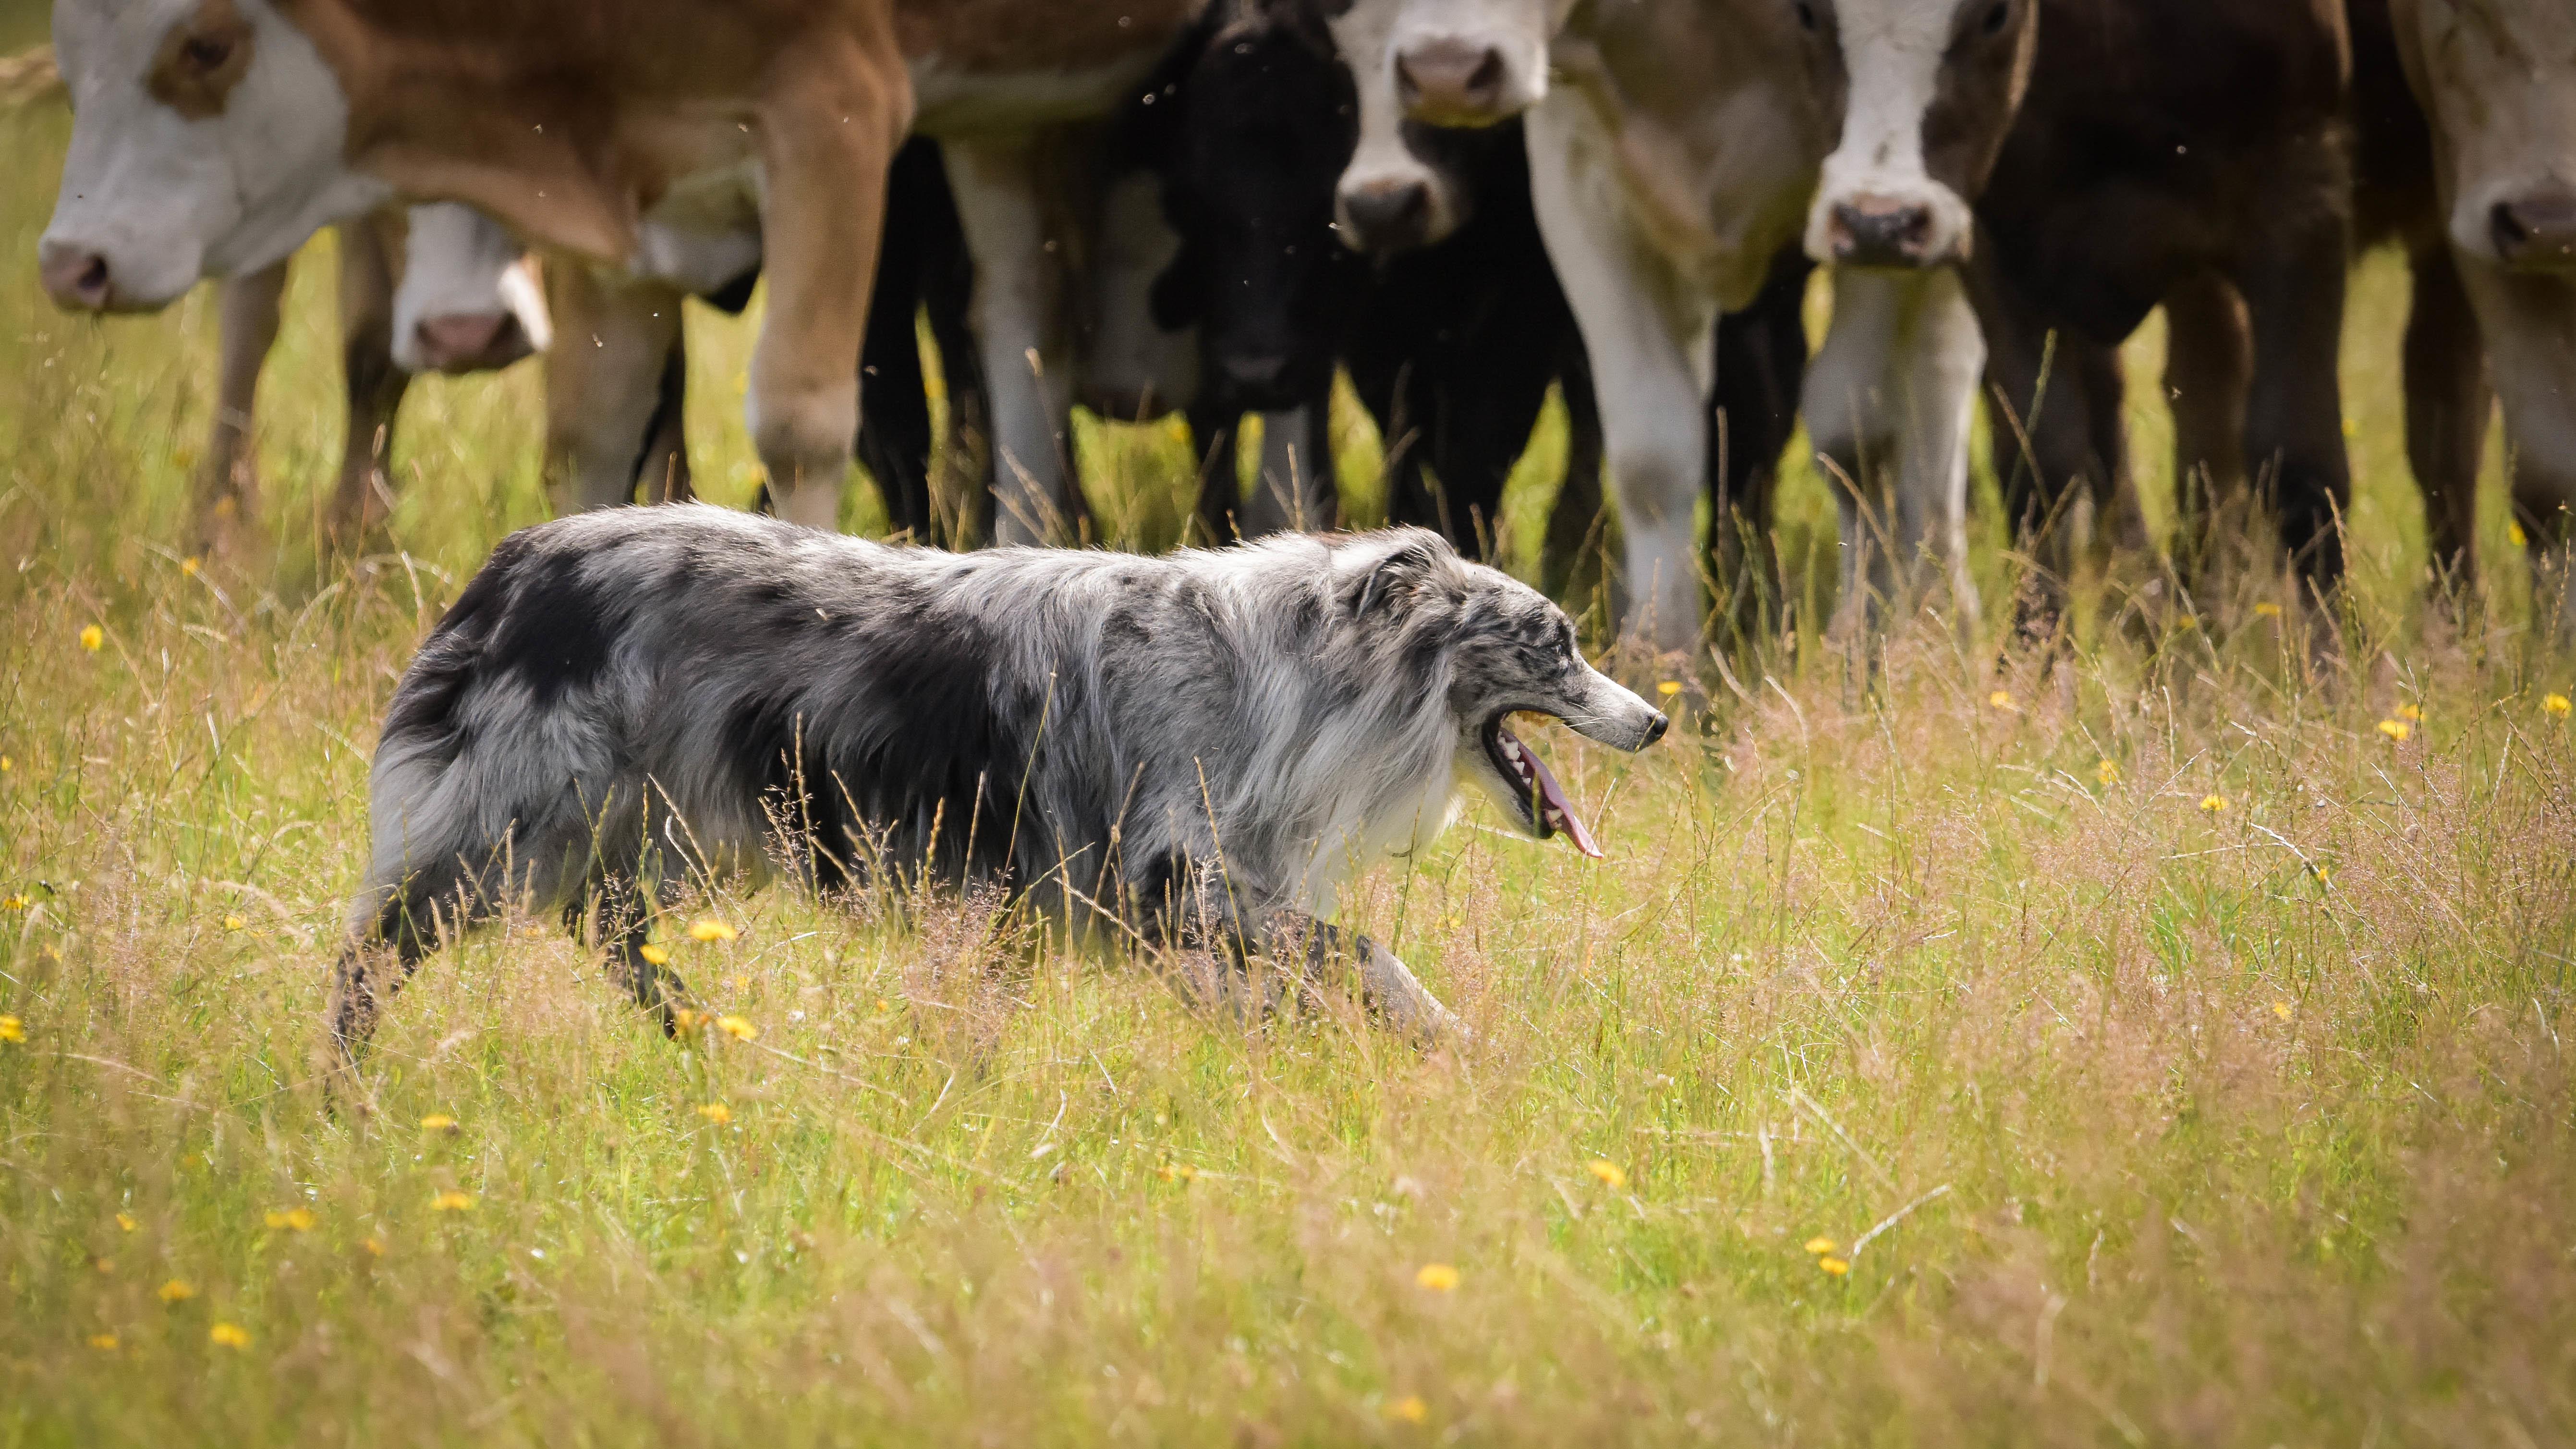 En Australian Shepherd framför nötdjur